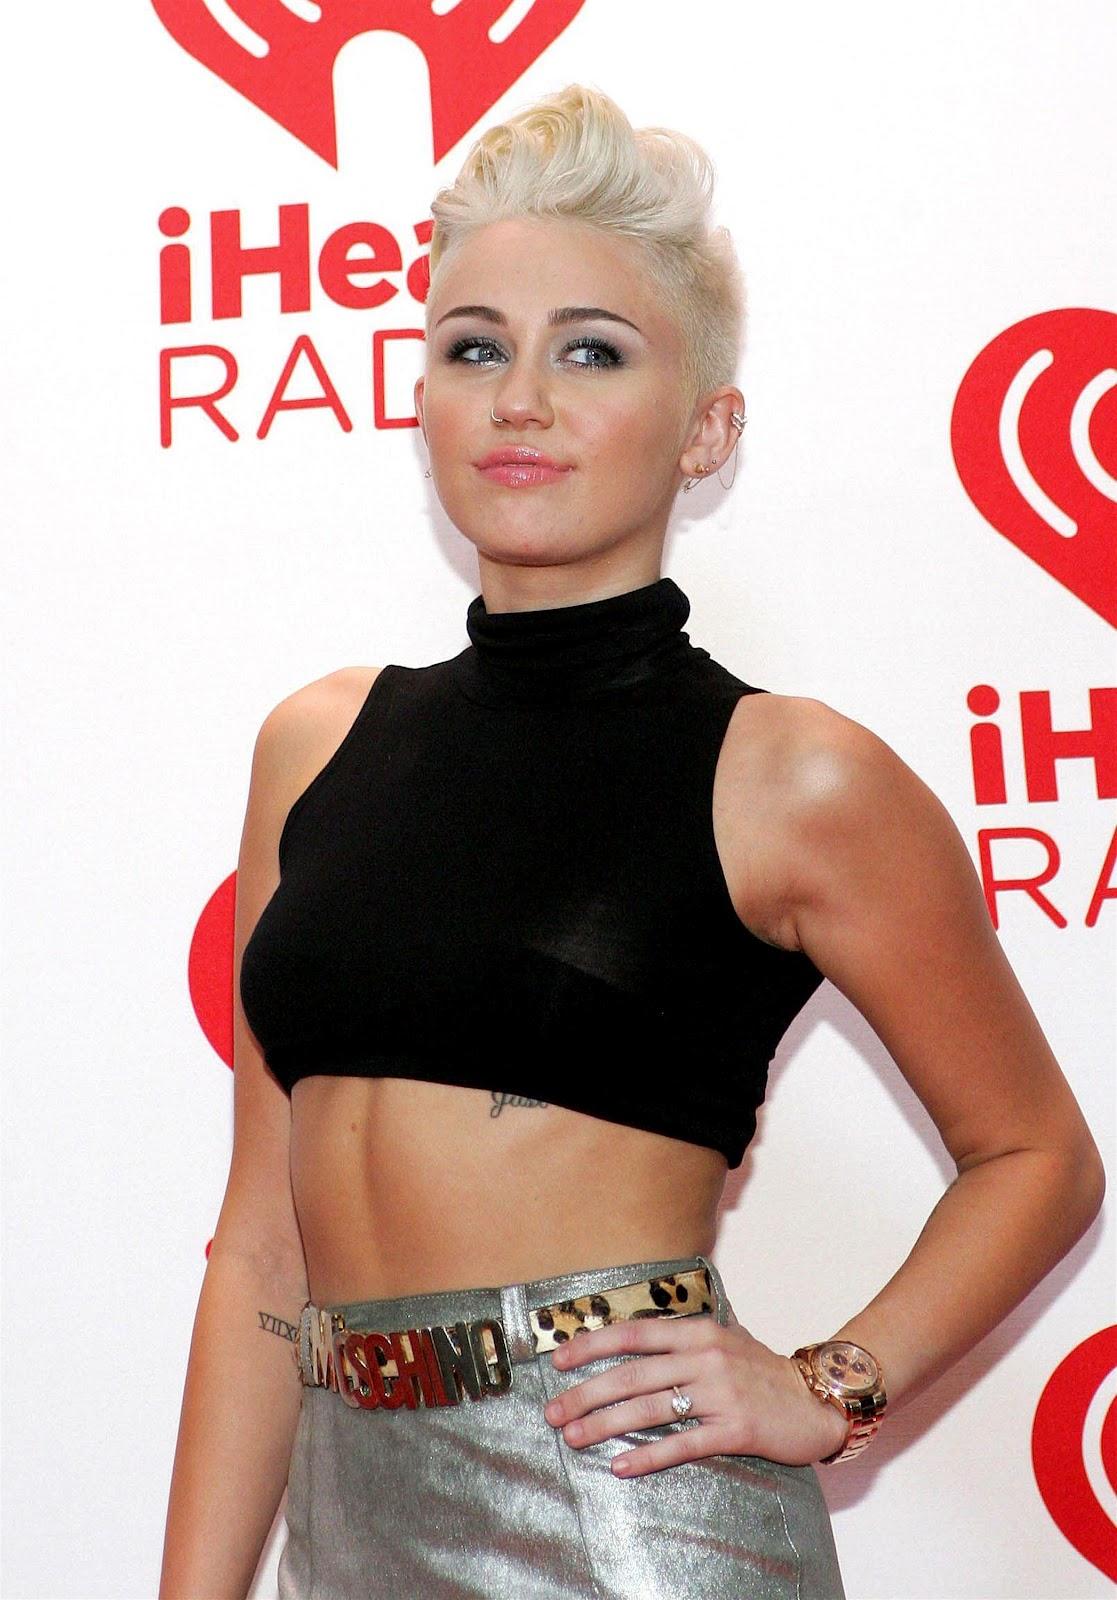 http://2.bp.blogspot.com/-7oqAMUIYSwc/UF-Nz2D1khI/AAAAAAAAMUM/bw0MsMRMh1o/s1600/Miley+Cyrus+iHeartRadio+Music+Festival++fashionagain80s.+linda+topete+P!nk+(2).jpg